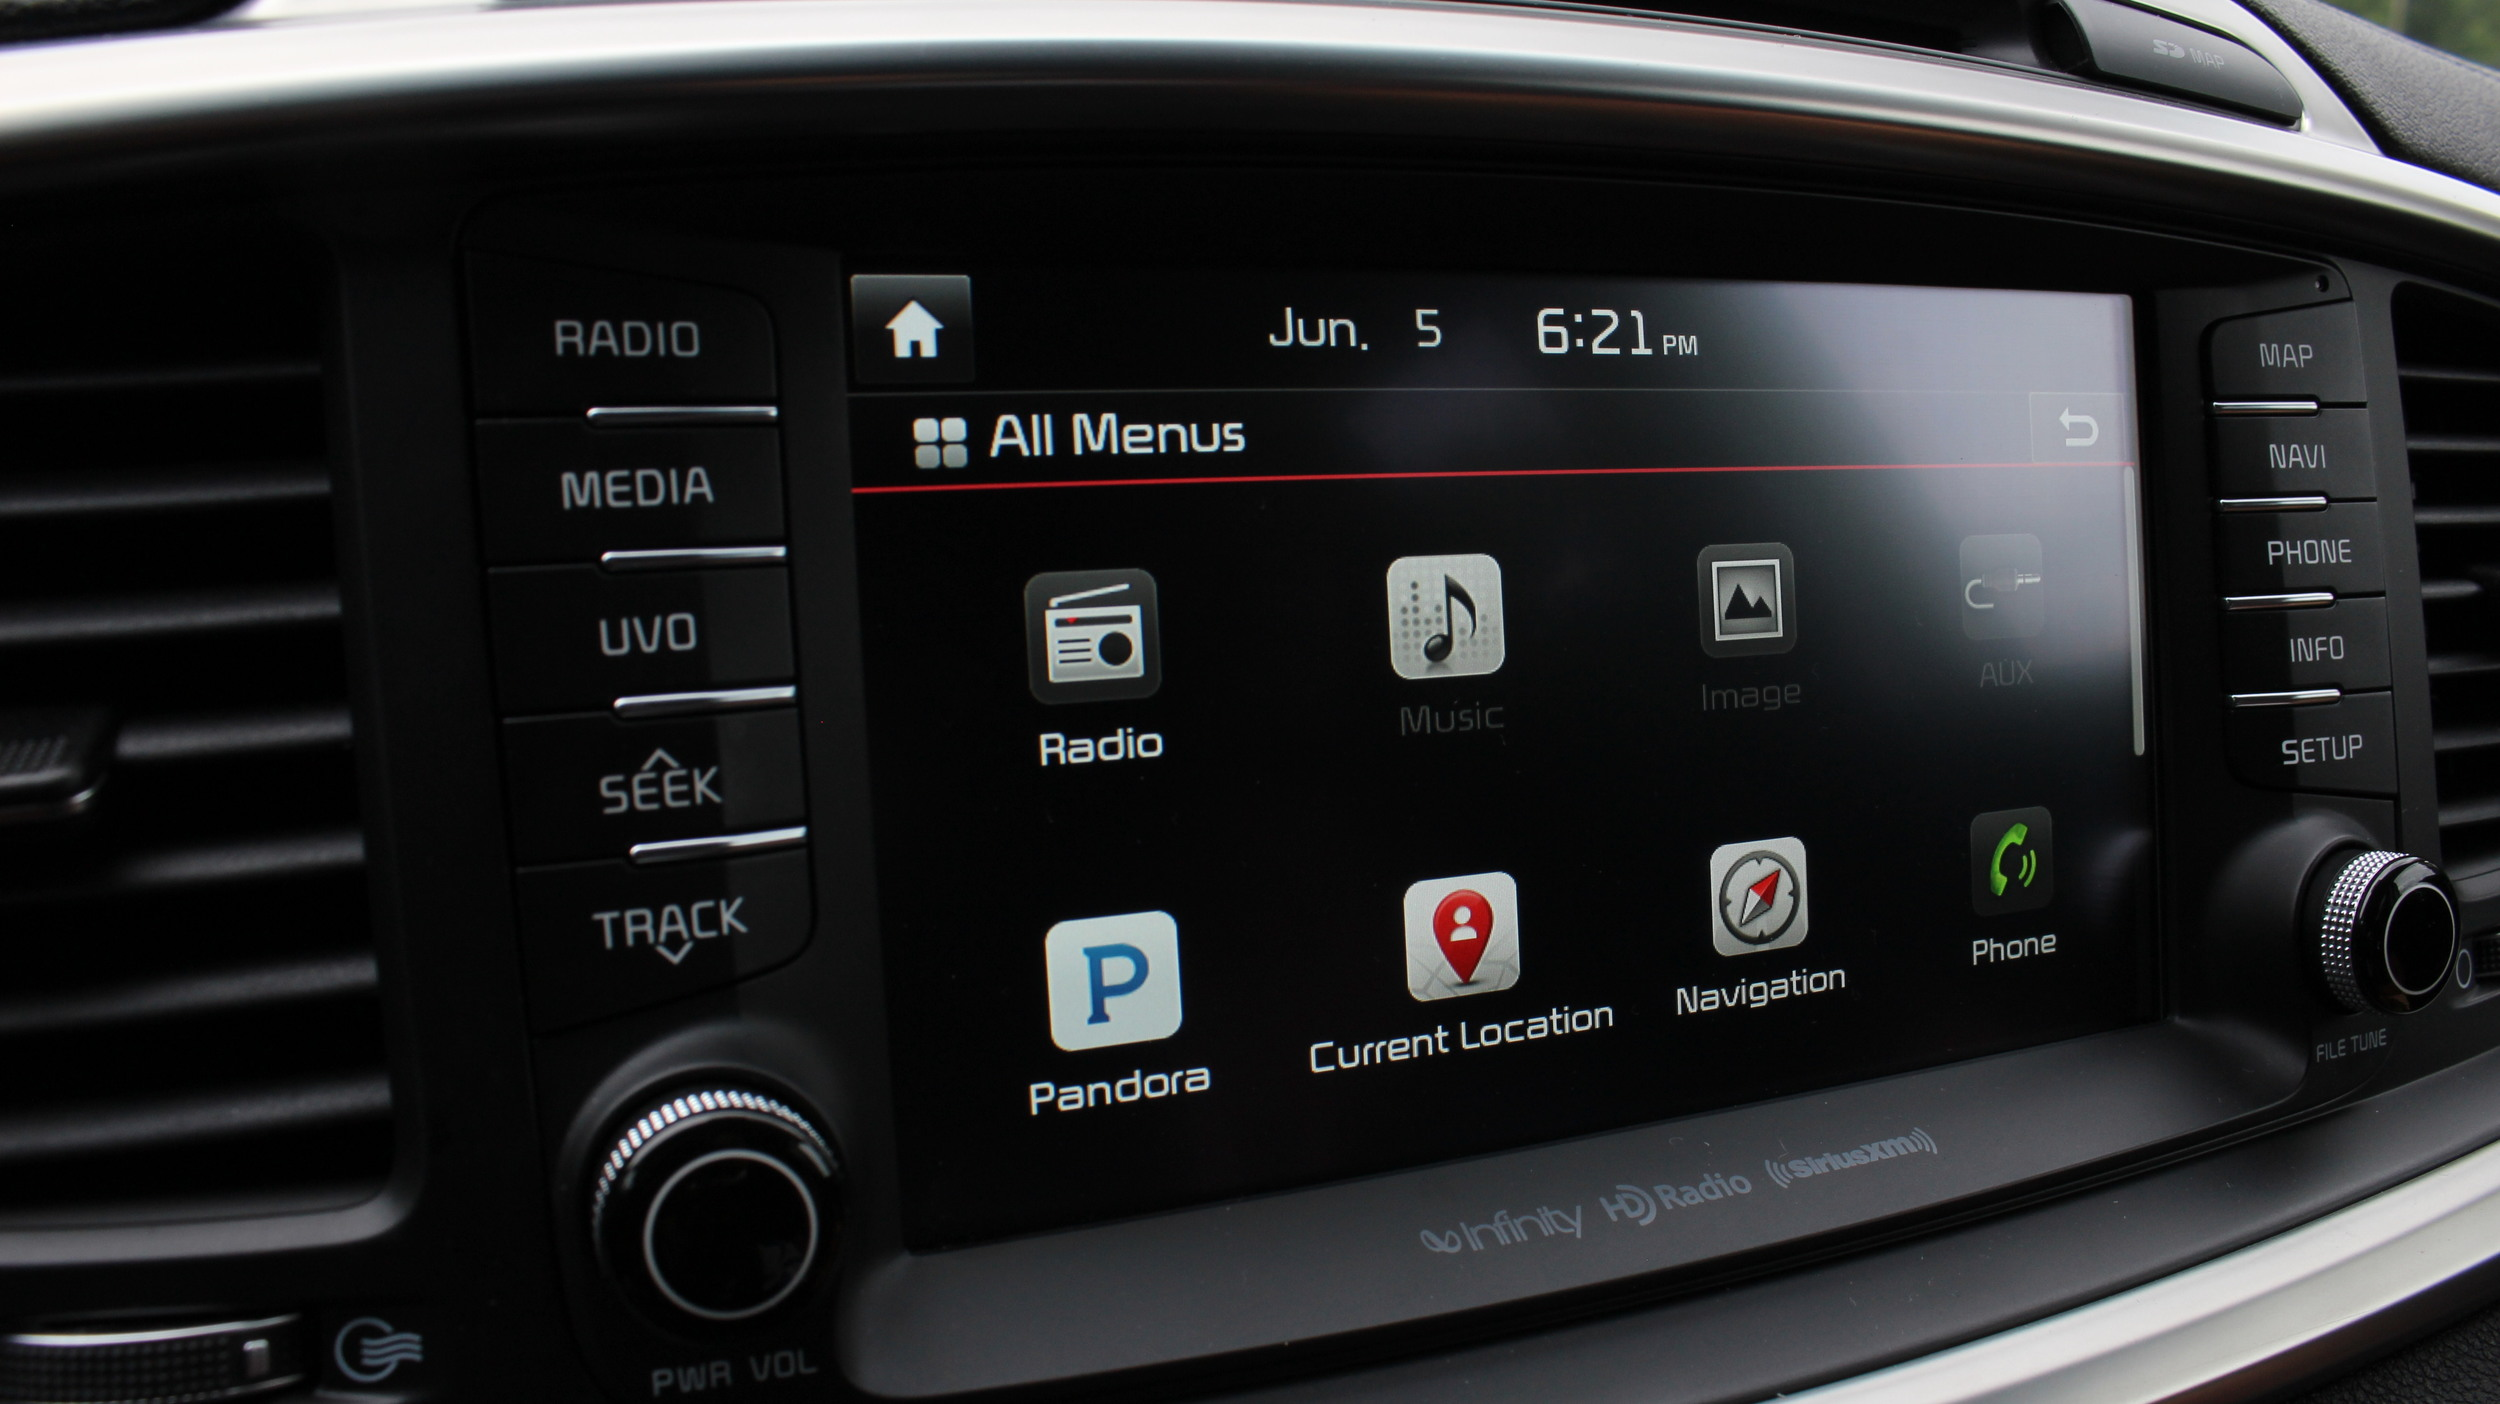 Navigation & Entertainment System